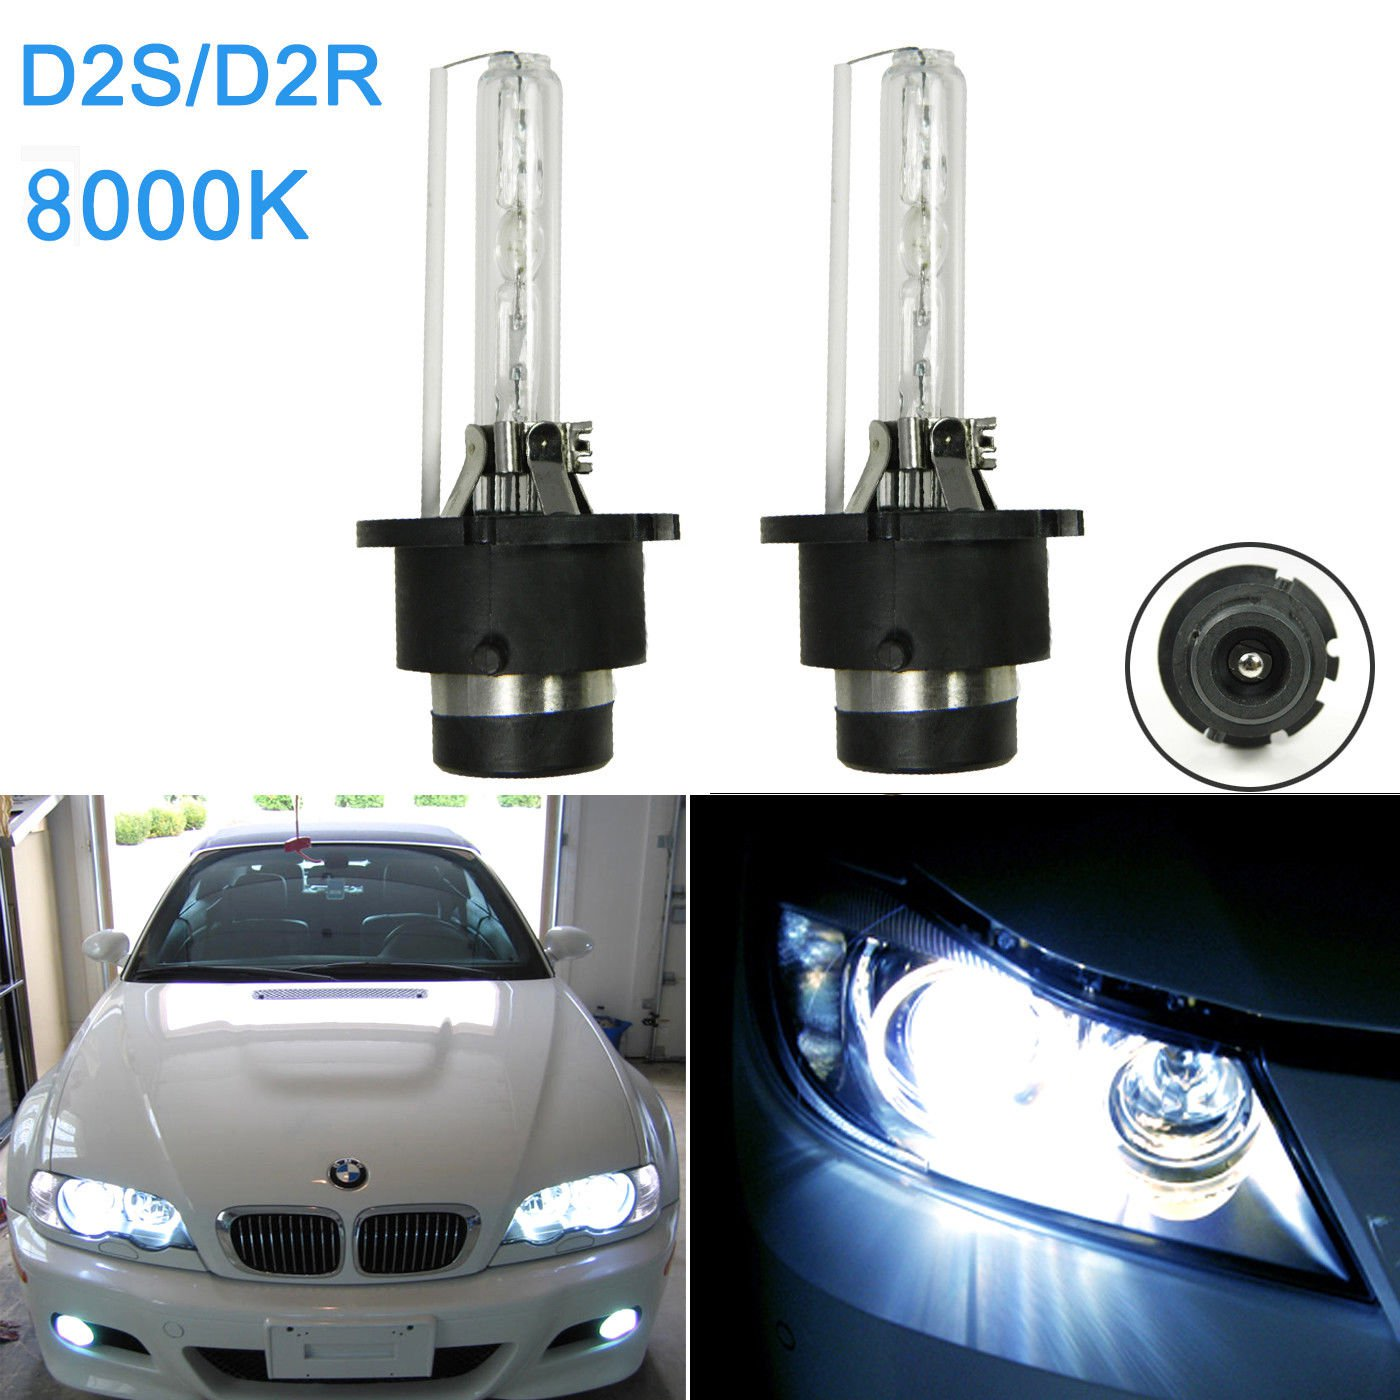 2x Blue D2S D2R HID Xenon Headlight Bulbs For Acura TL TSX